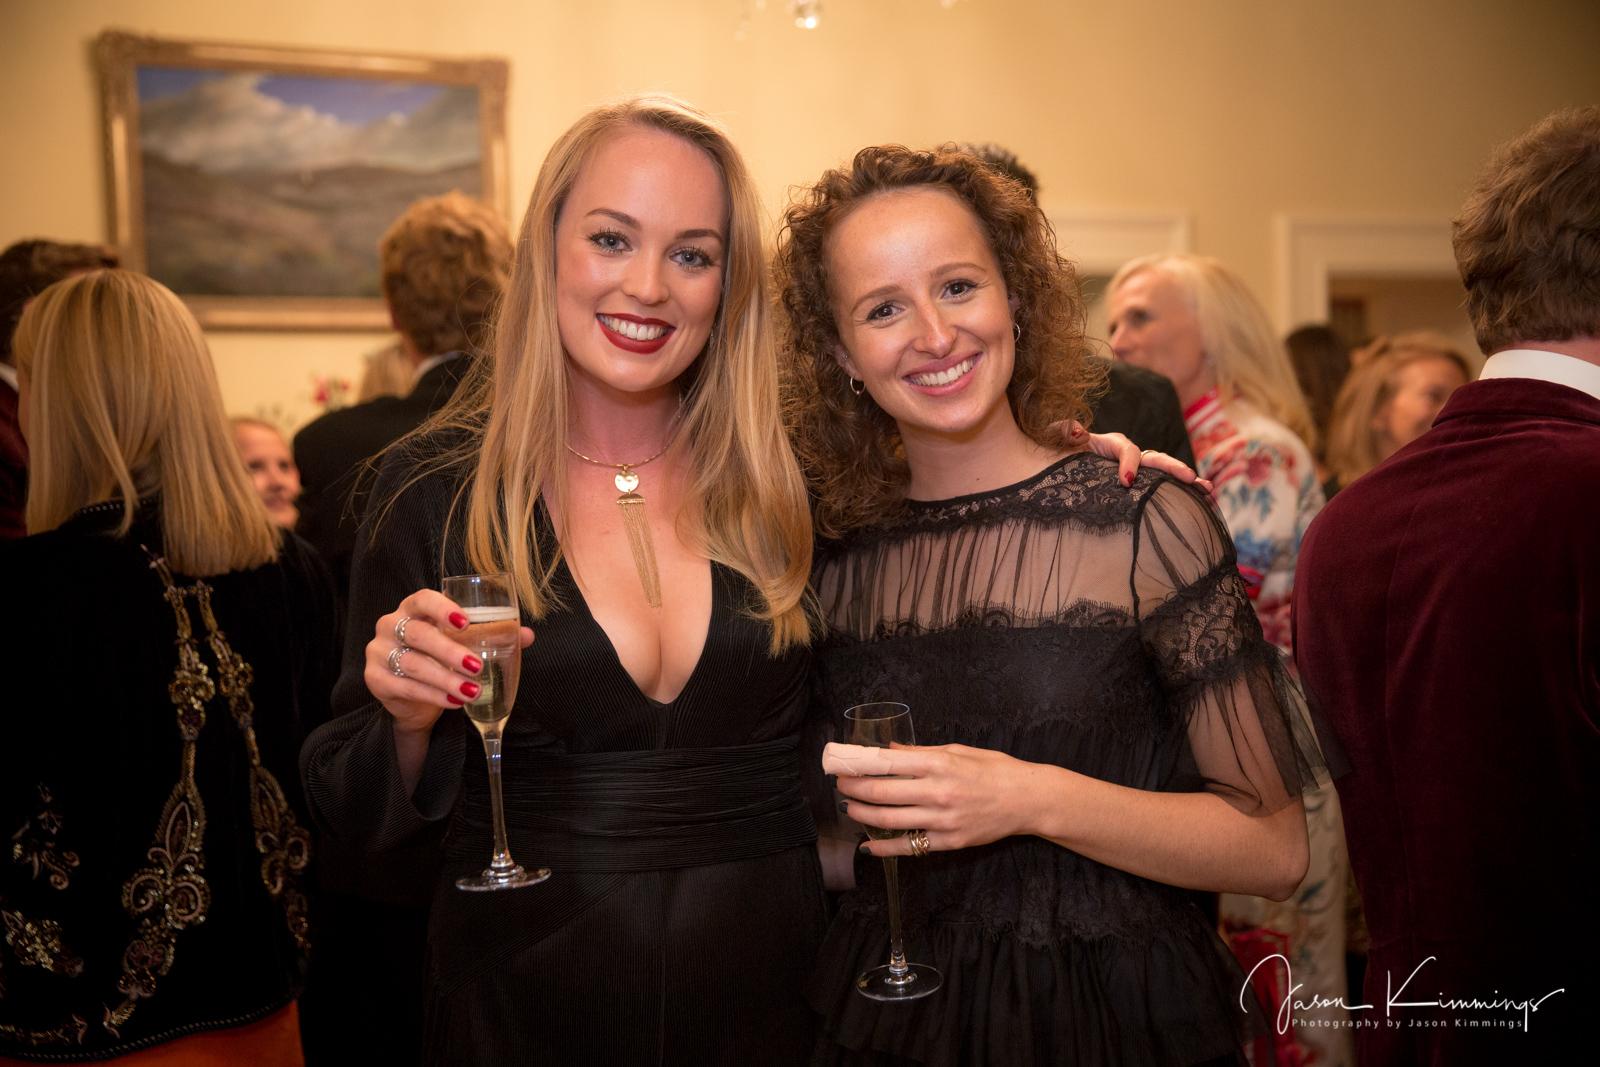 Party-event-photography-west-lothian-edinburgh-glasgow-11.jpg